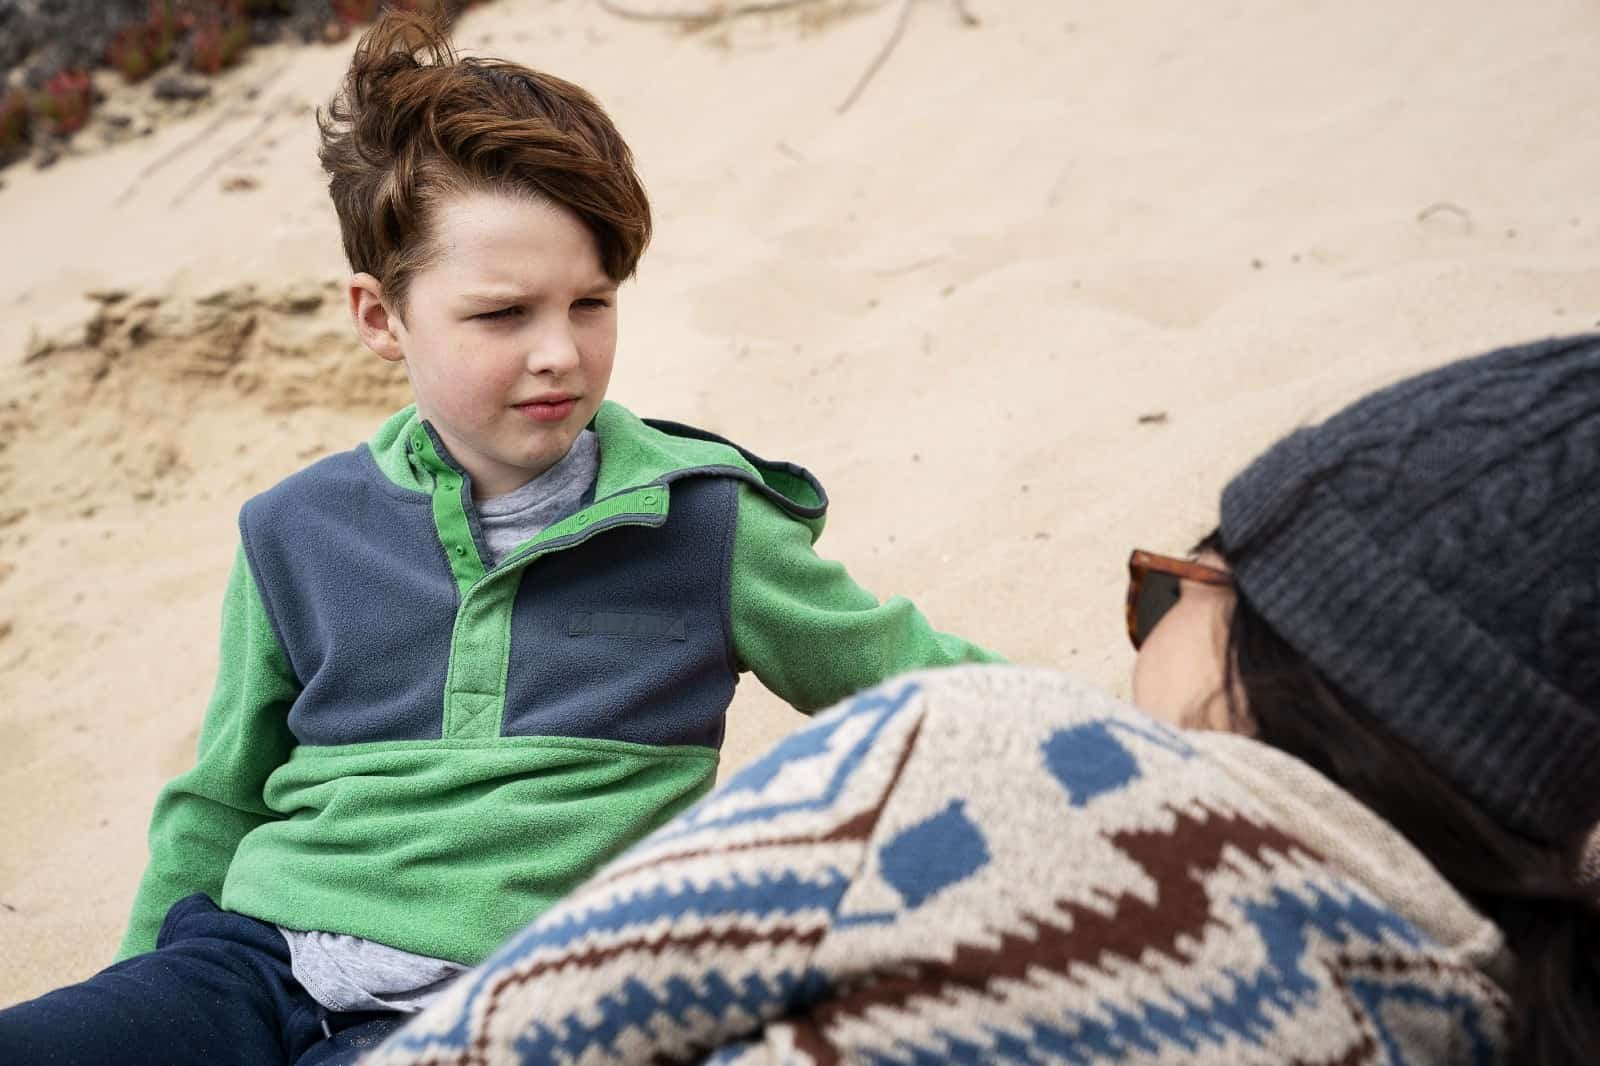 Iain Armitage como Ziggy y Shailene Woodley como Jane en Big Little Lies 2x07